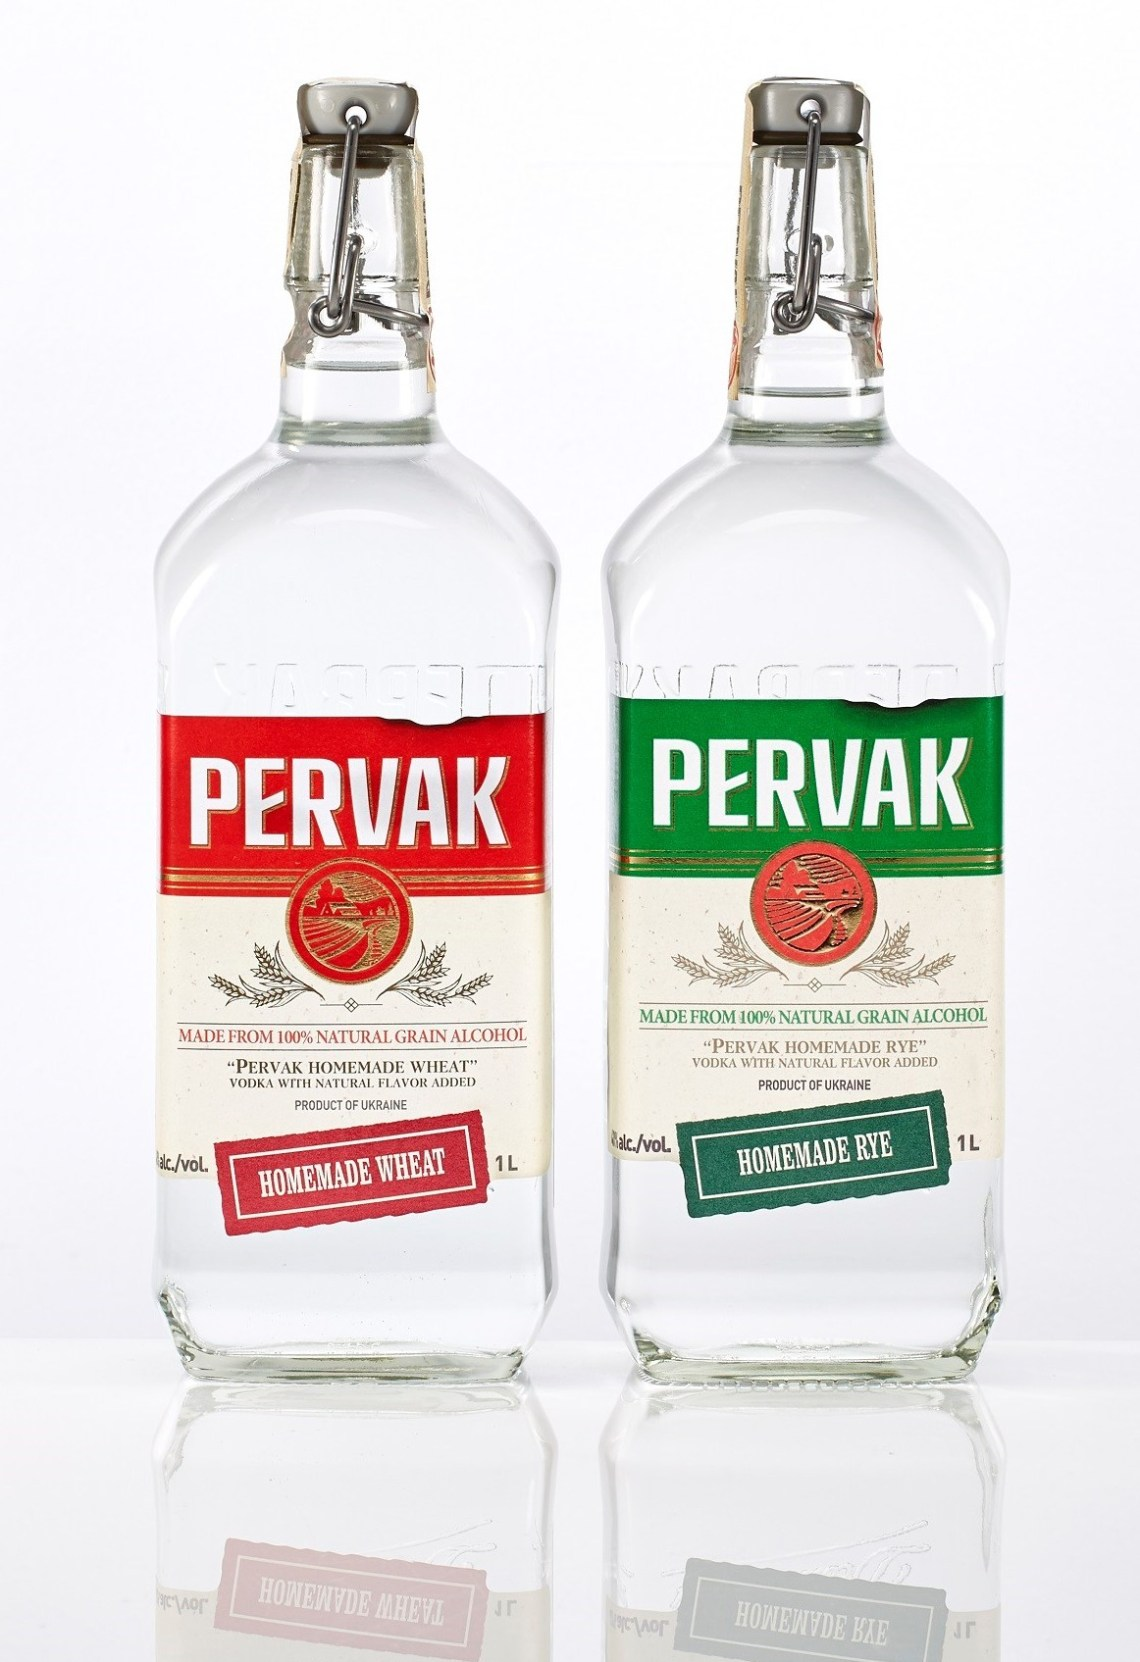 Pervak Vodka Homemade Wheat